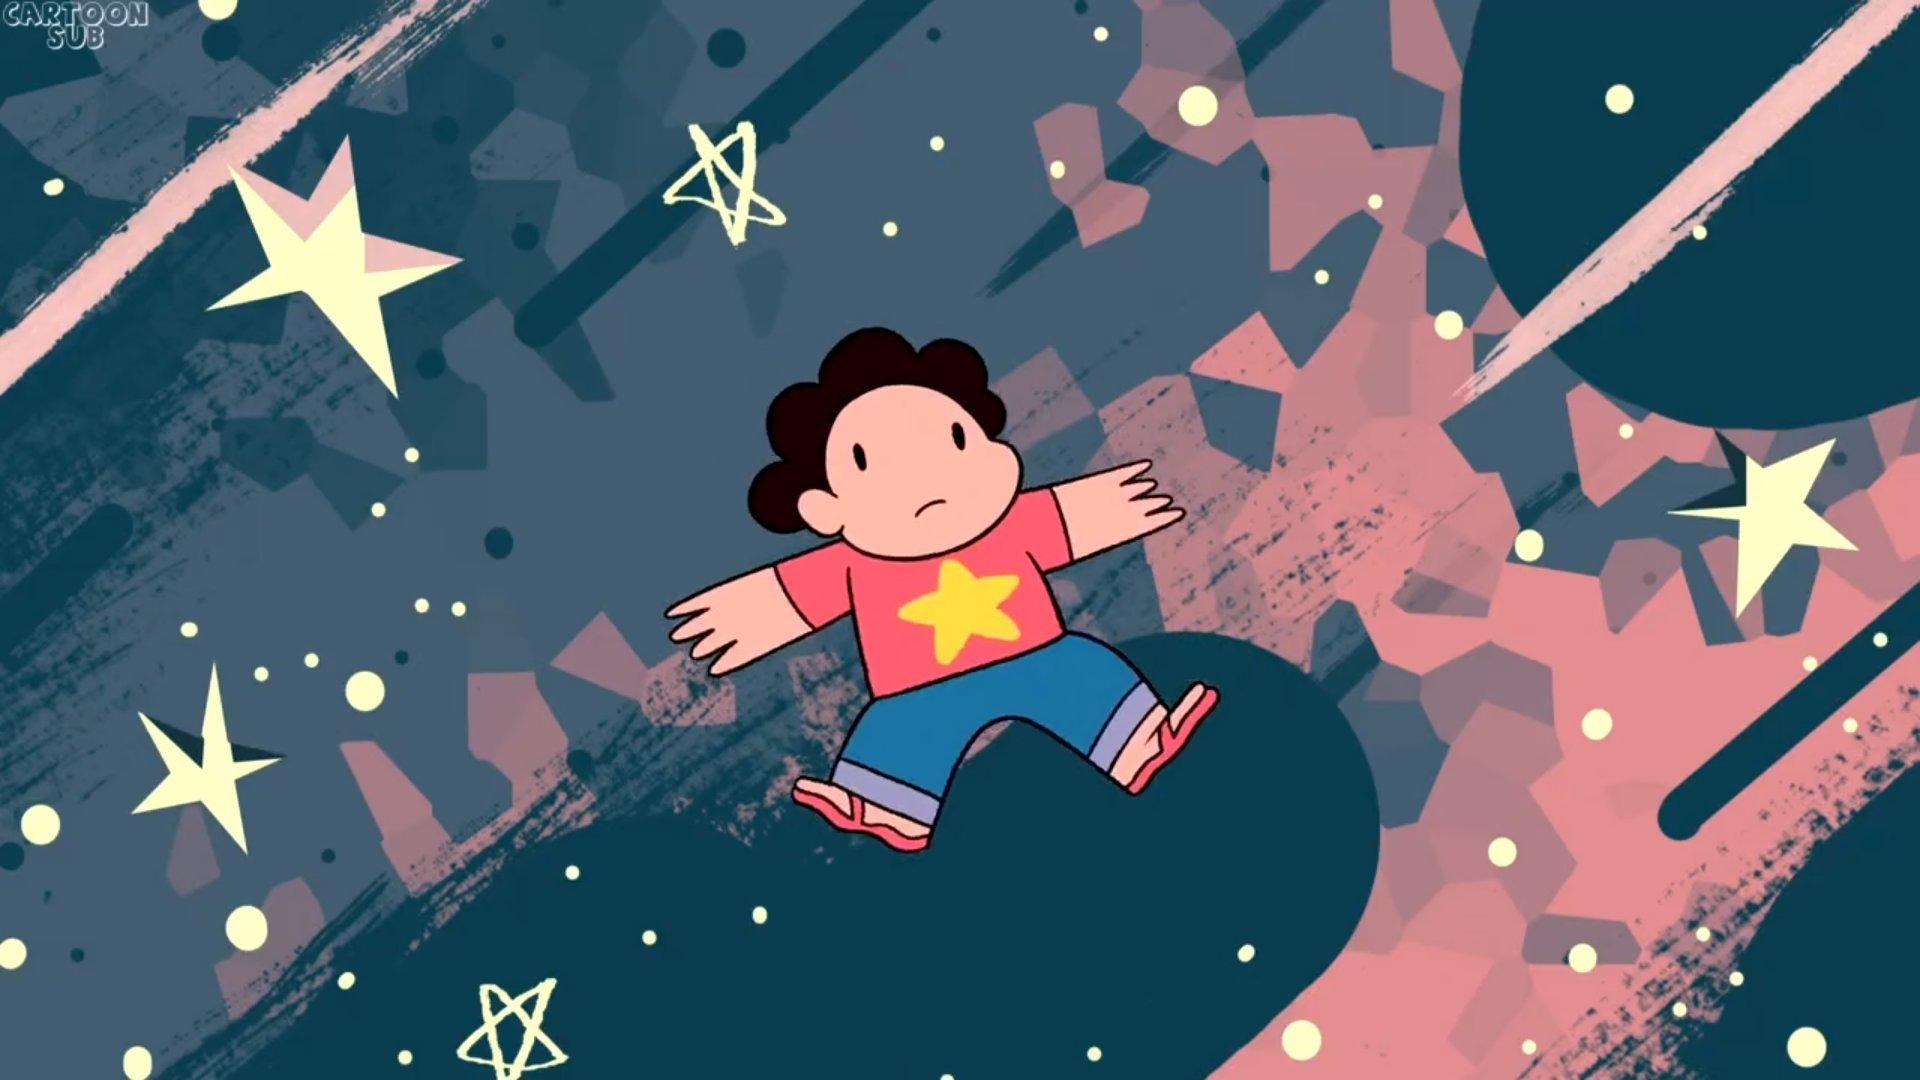 Steven Universe Wallpaper Free